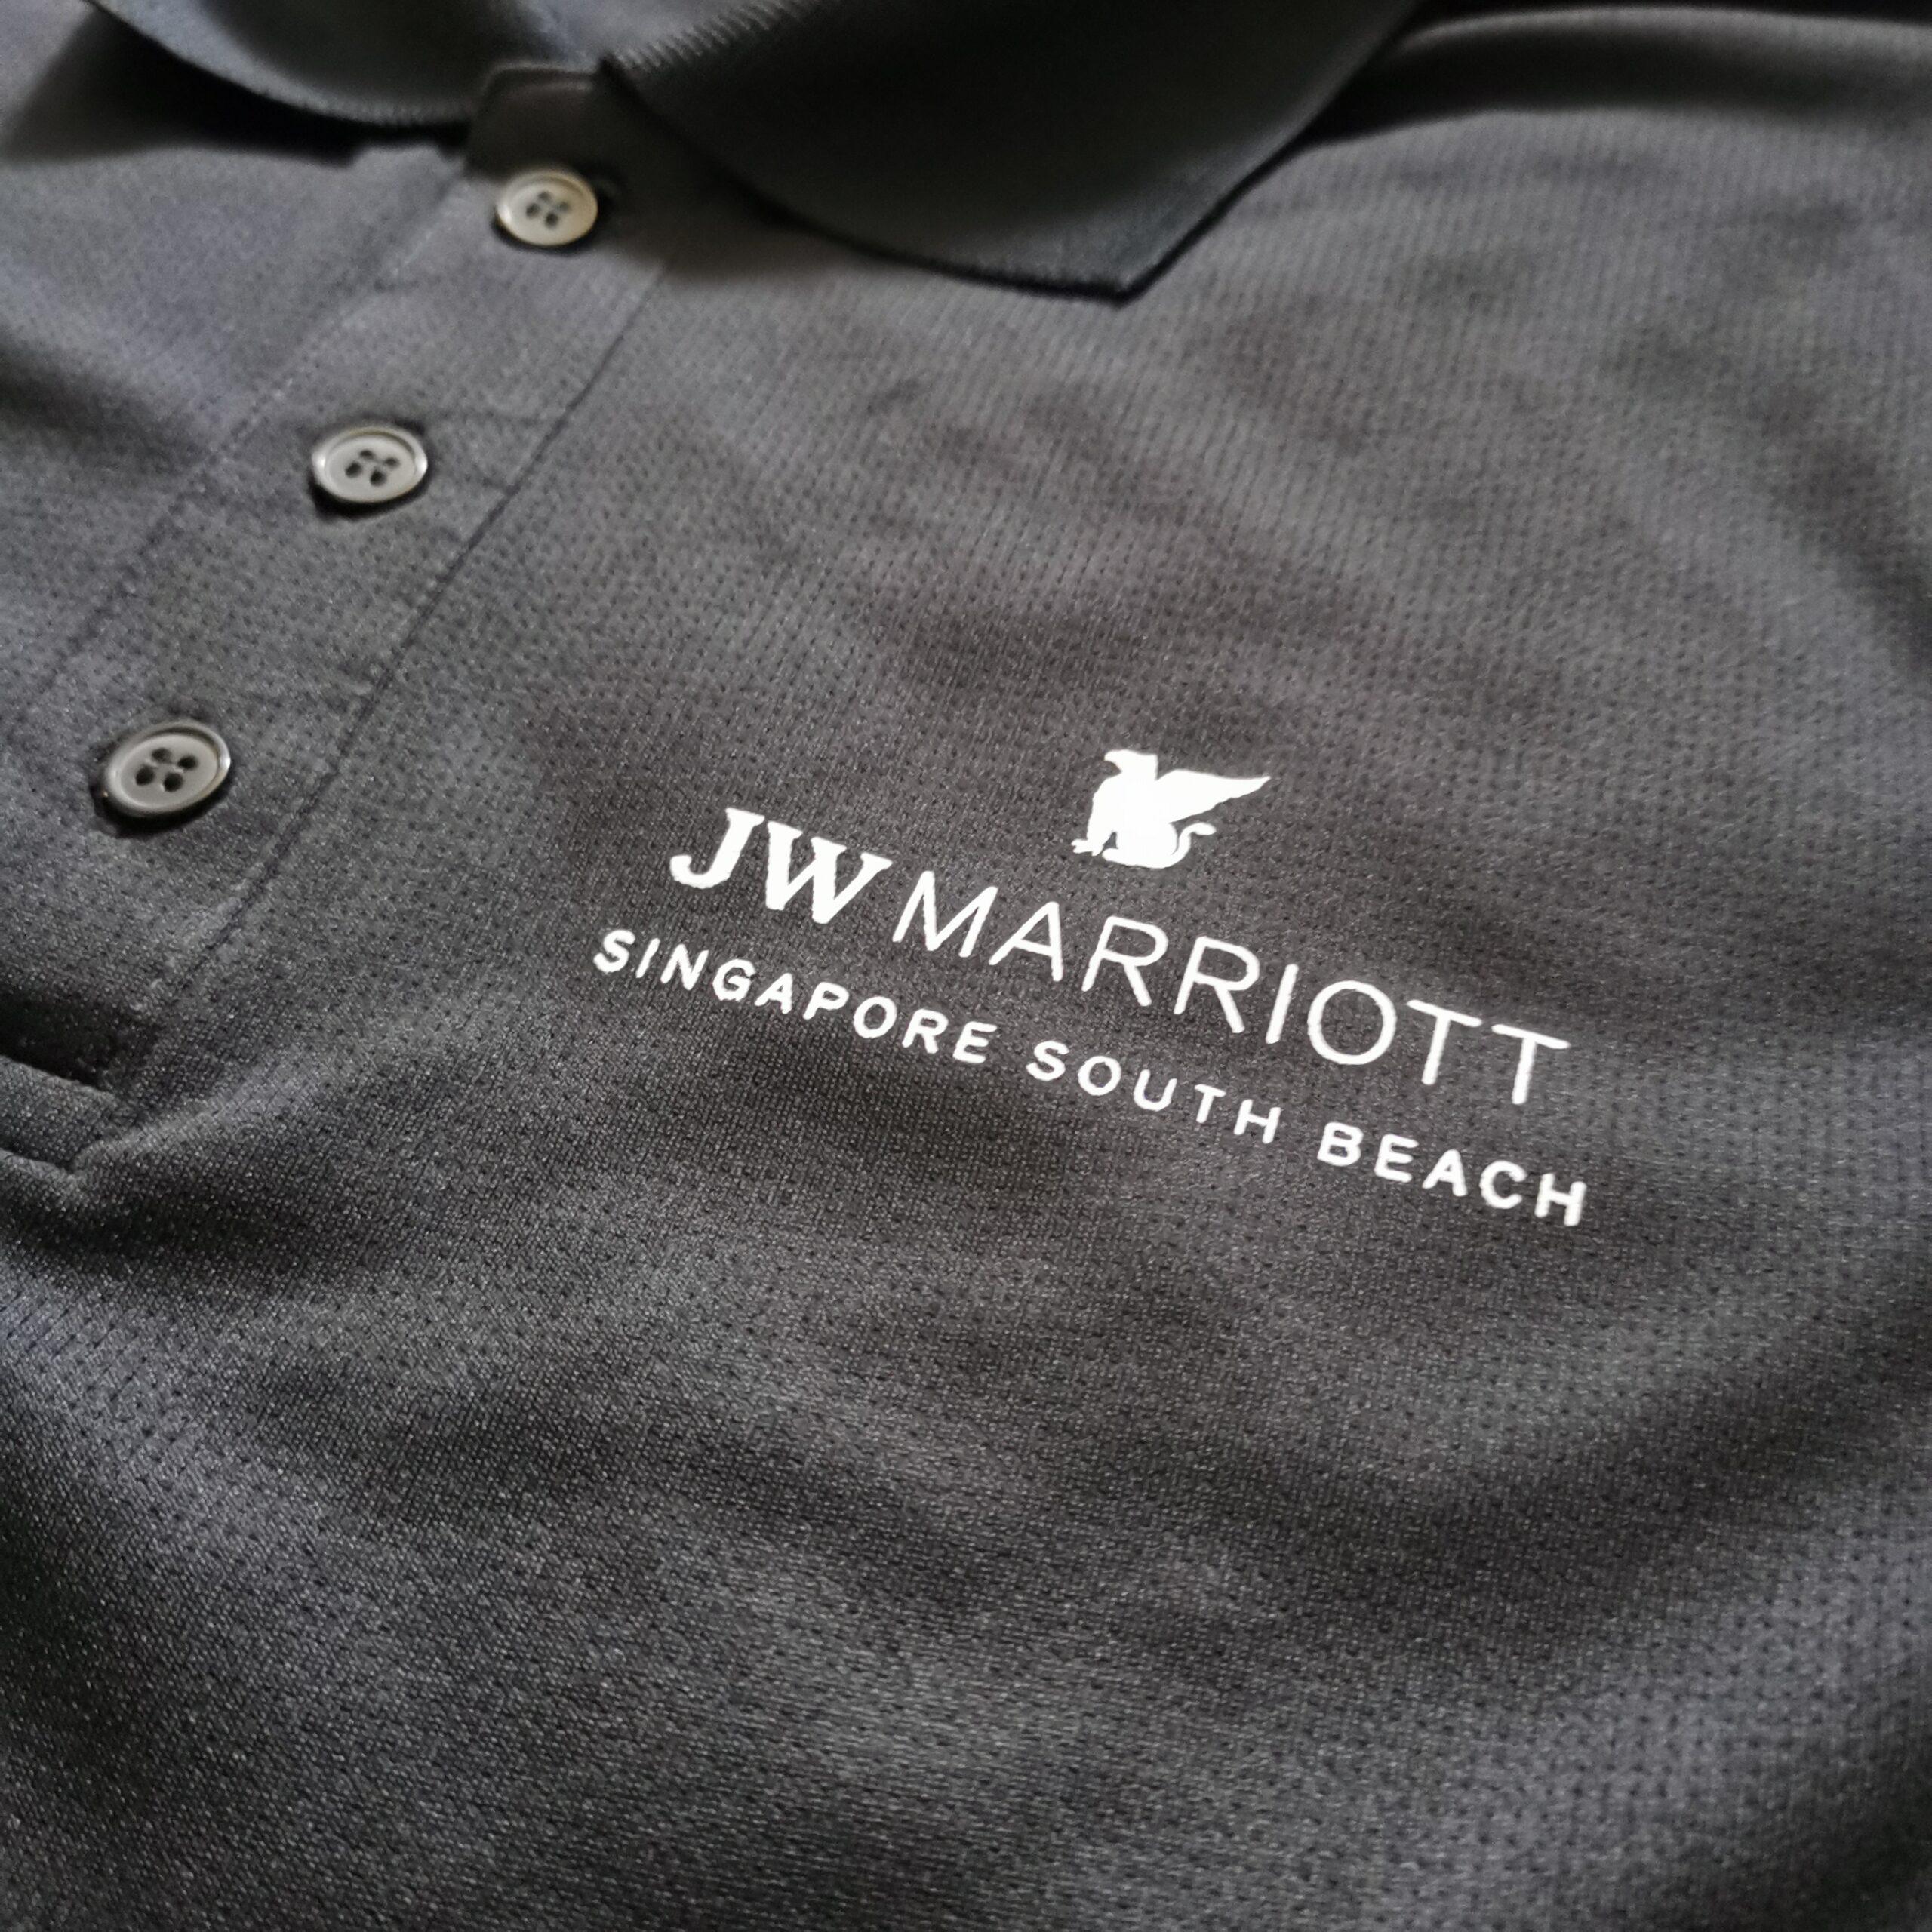 JW Marriott Custom Print Polo T-Shirt